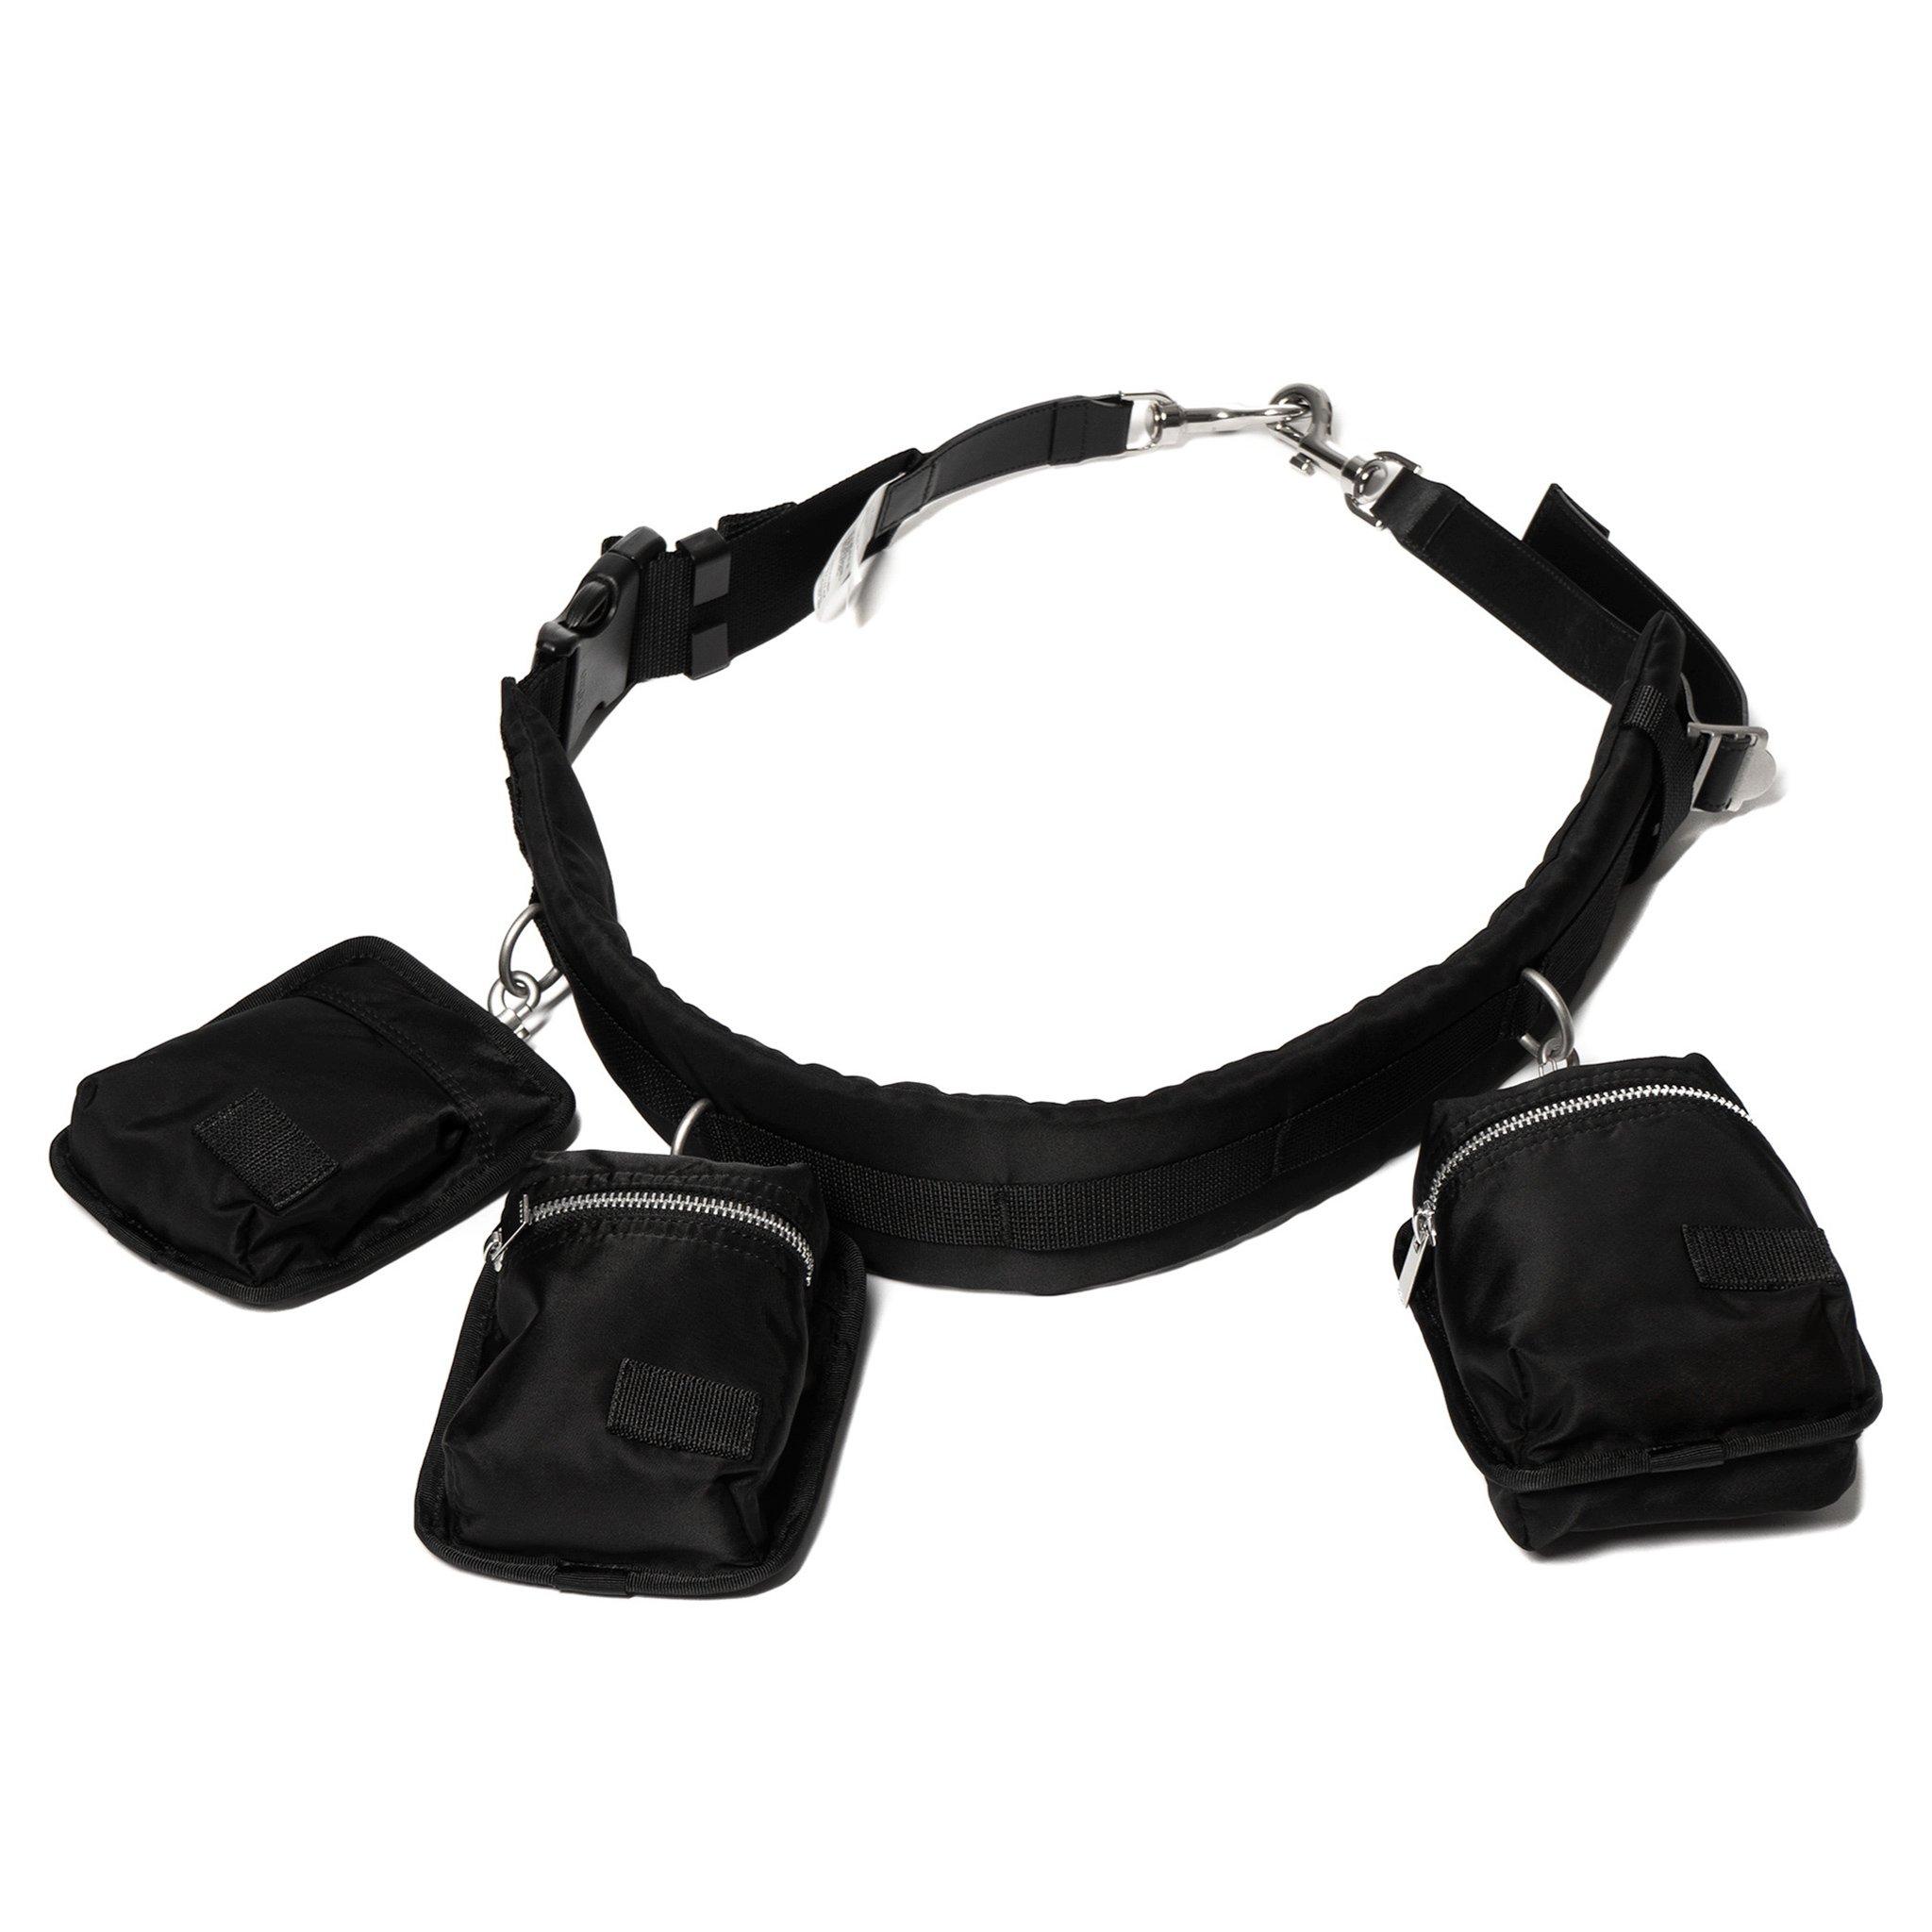 HAVEN-Sacai-Belt-Bag-BLACK-1_2048x2048.progressive.jpg